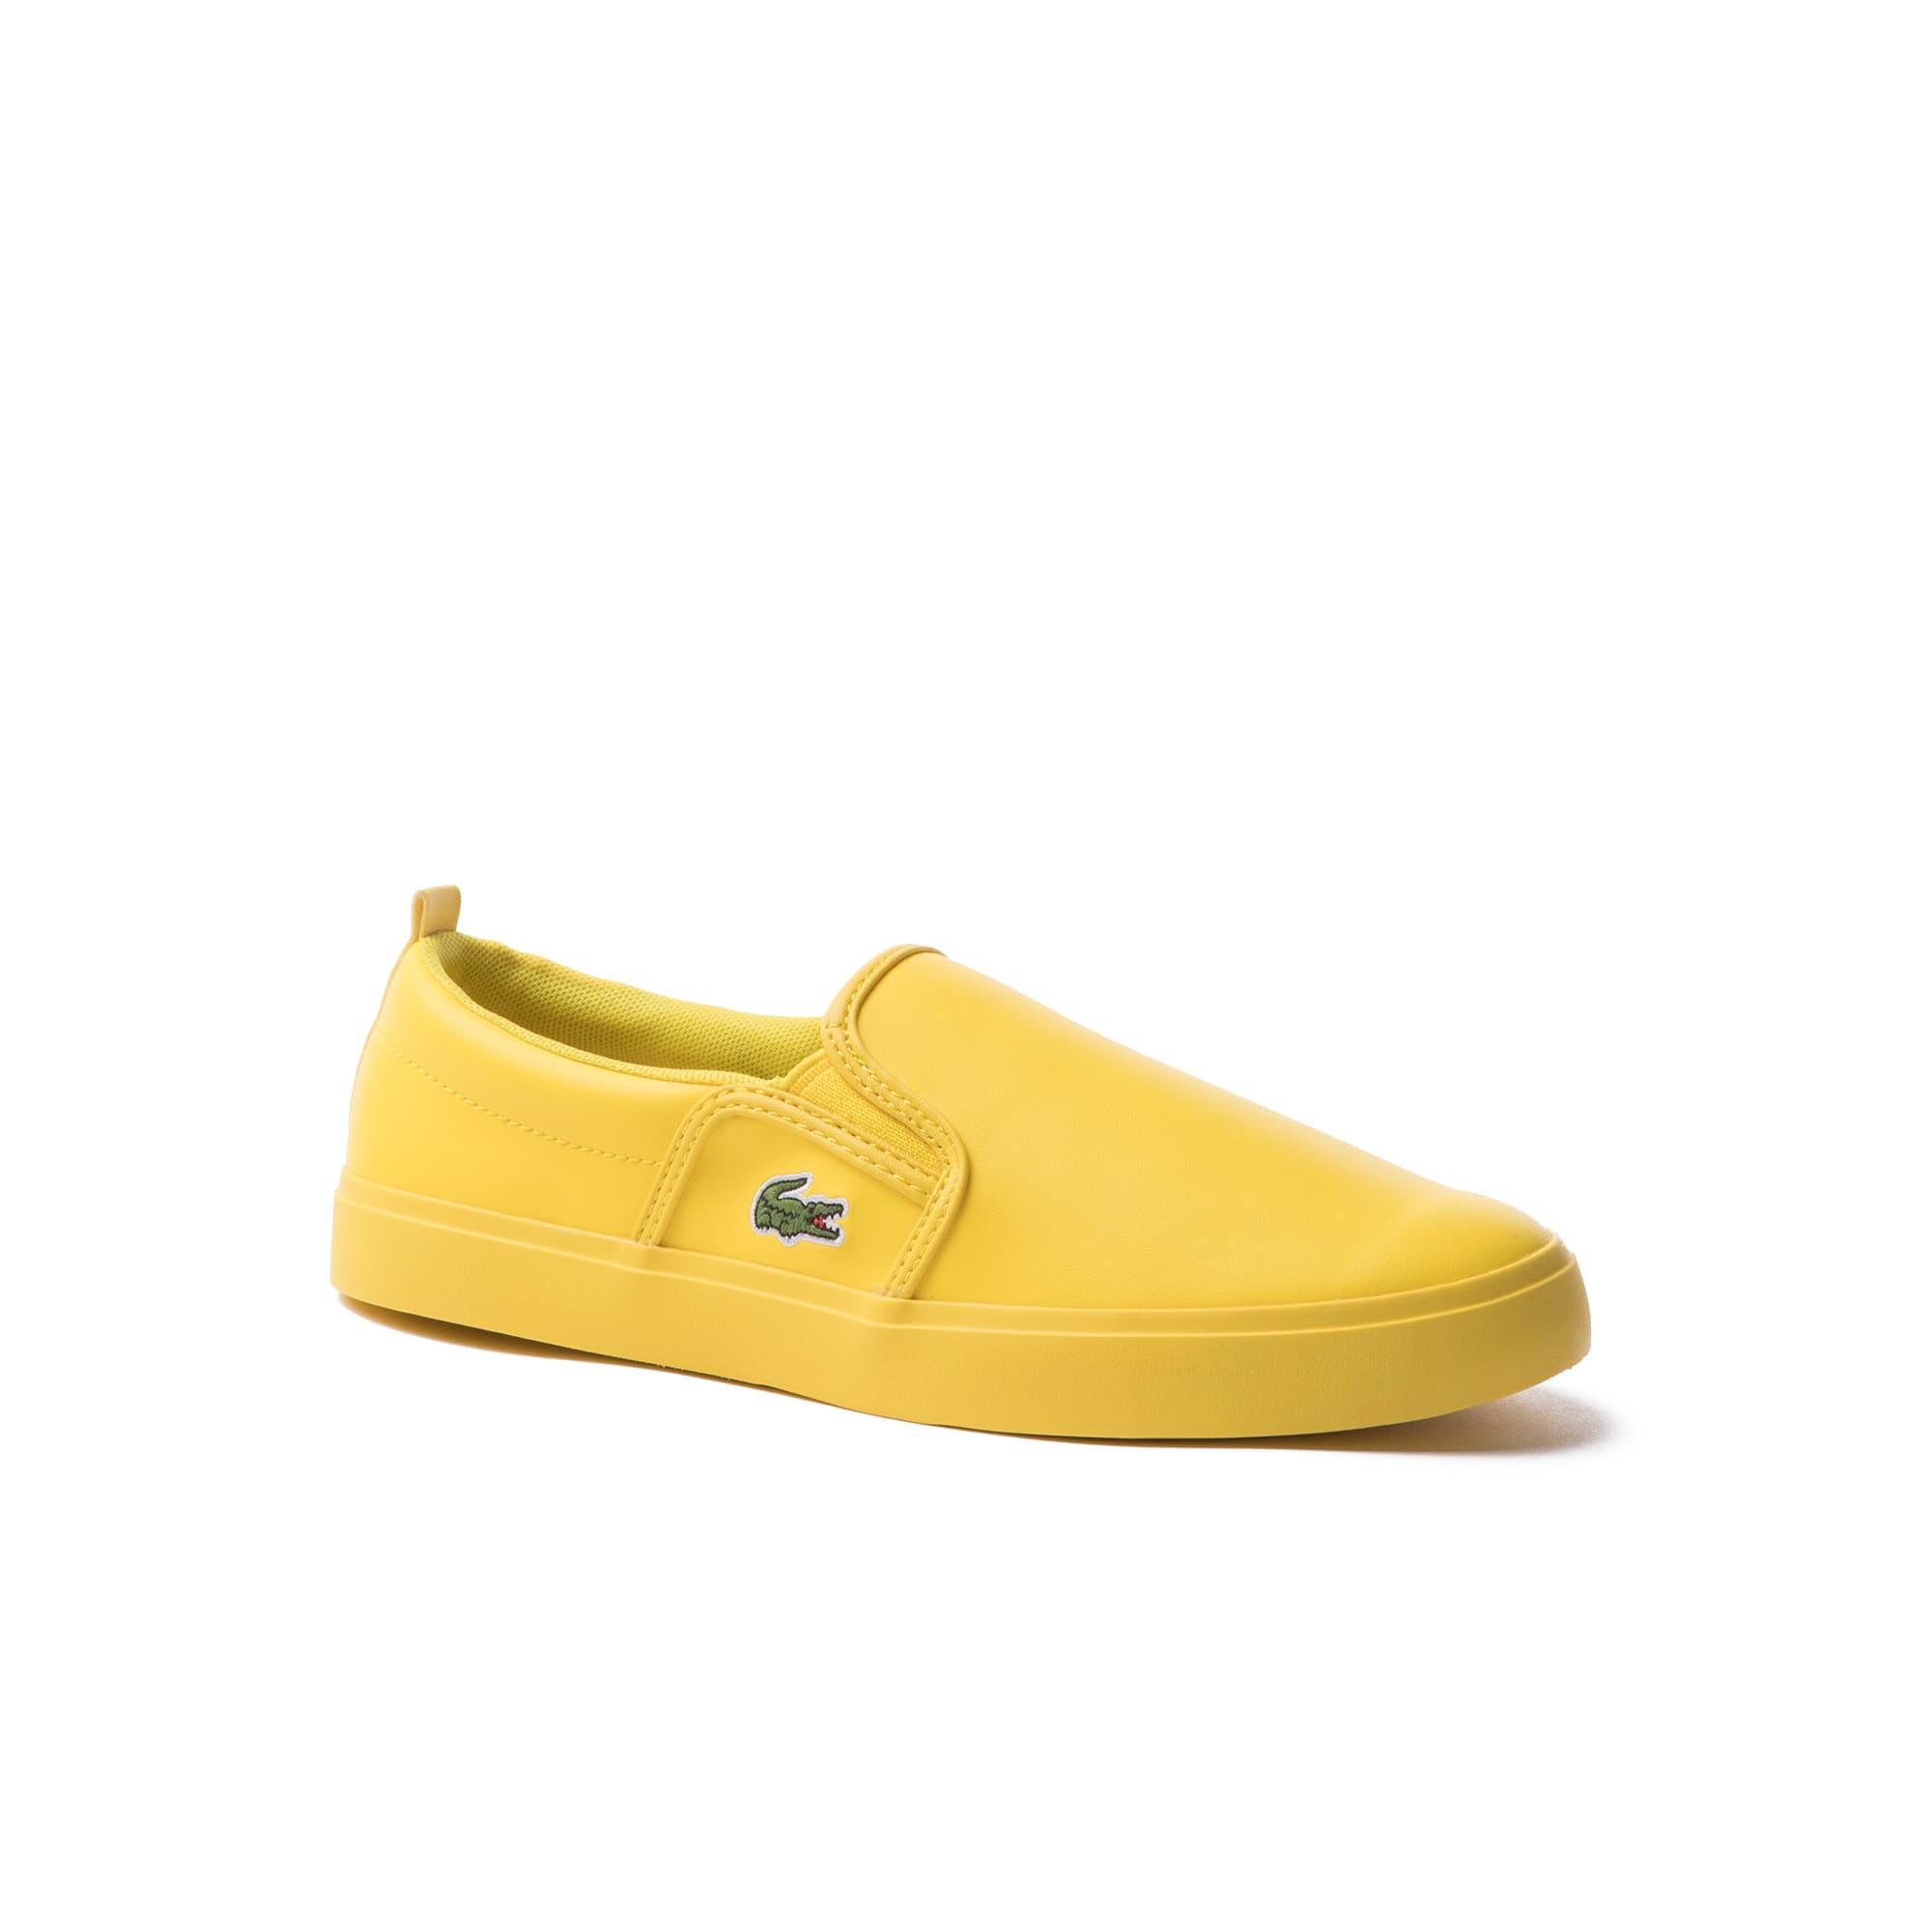 Kids' Gazon Slip-ons